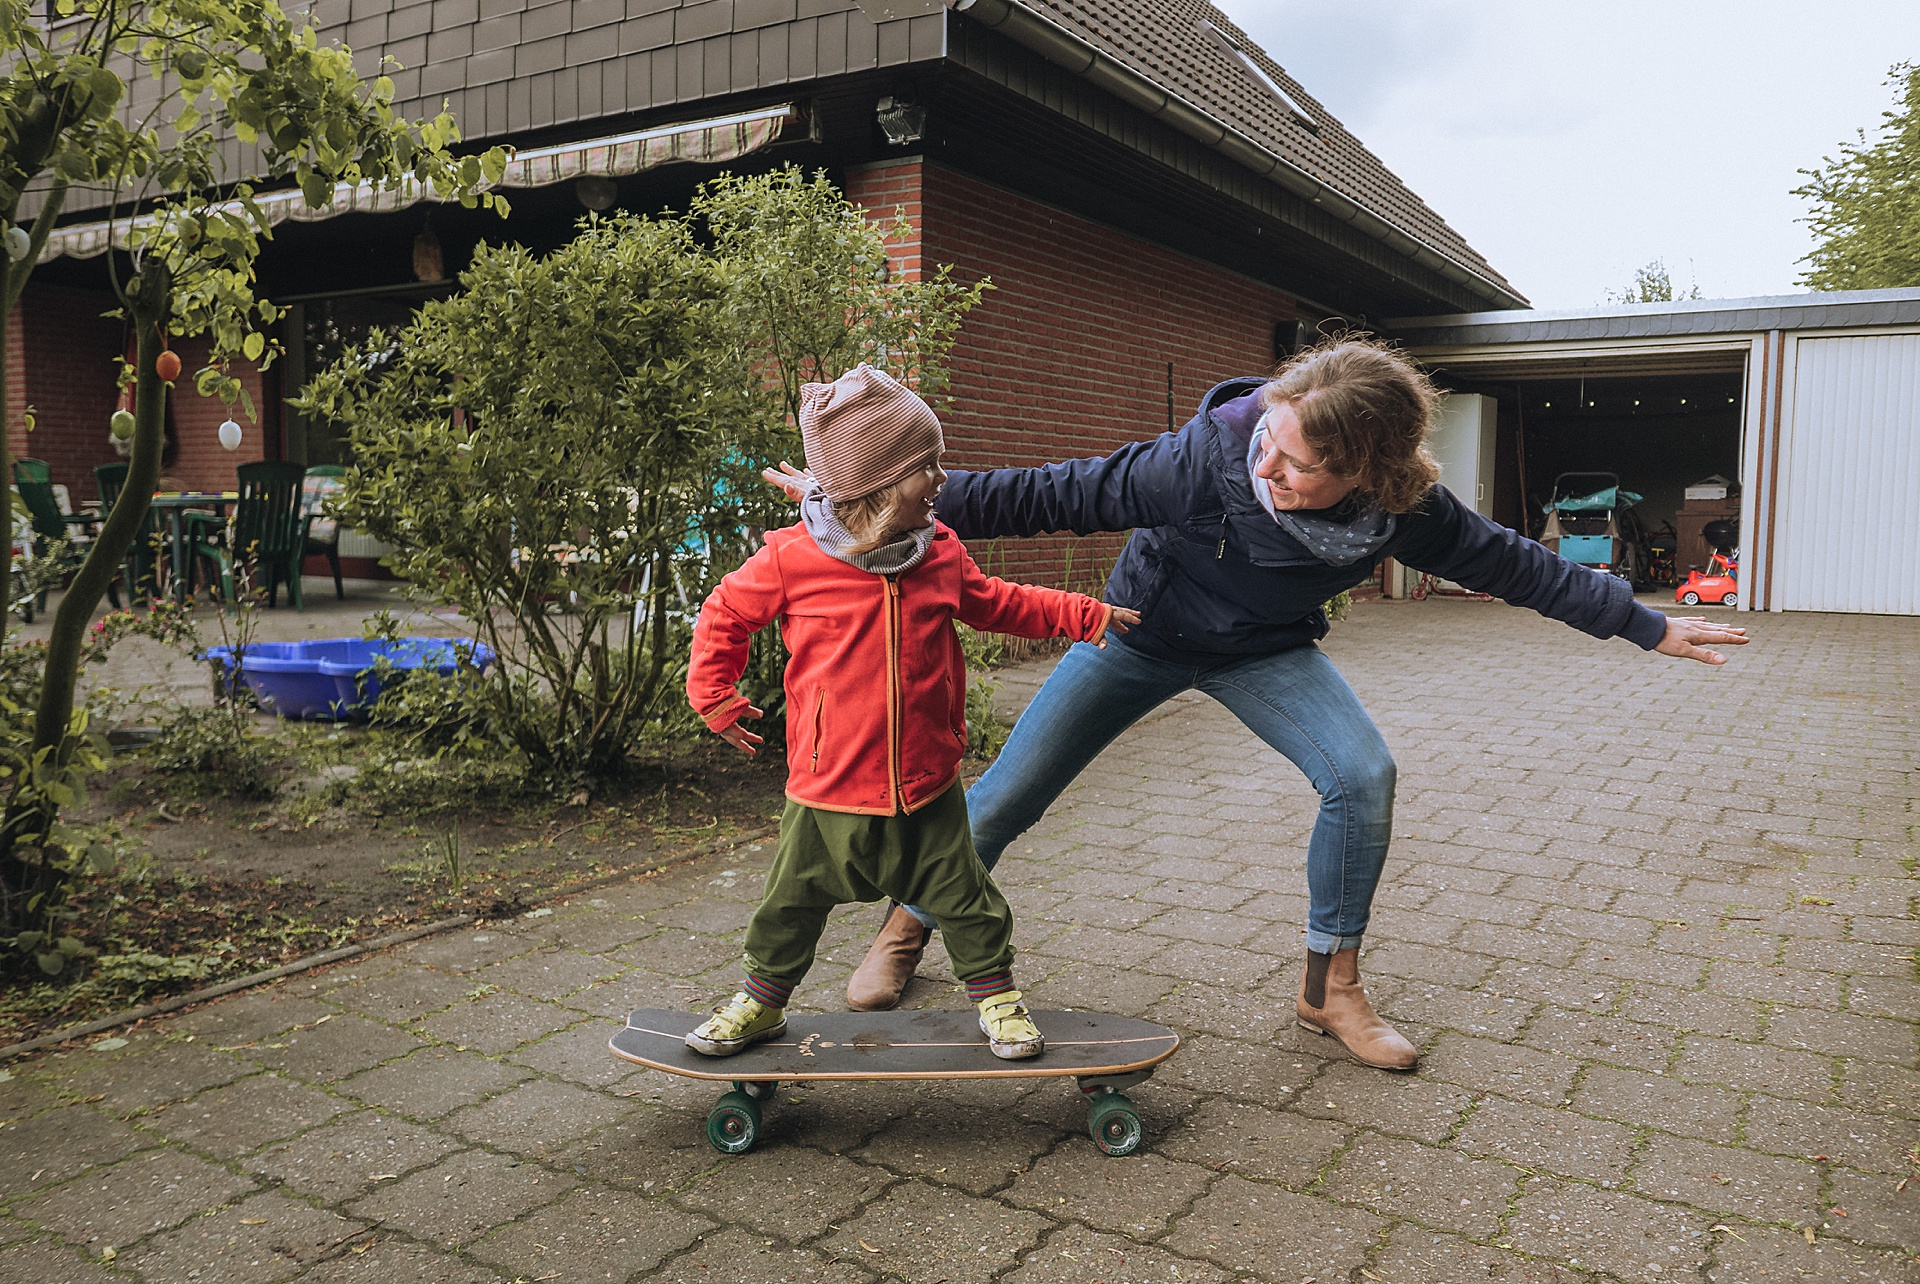 Skatergirl auf Papas Carver Skateboard